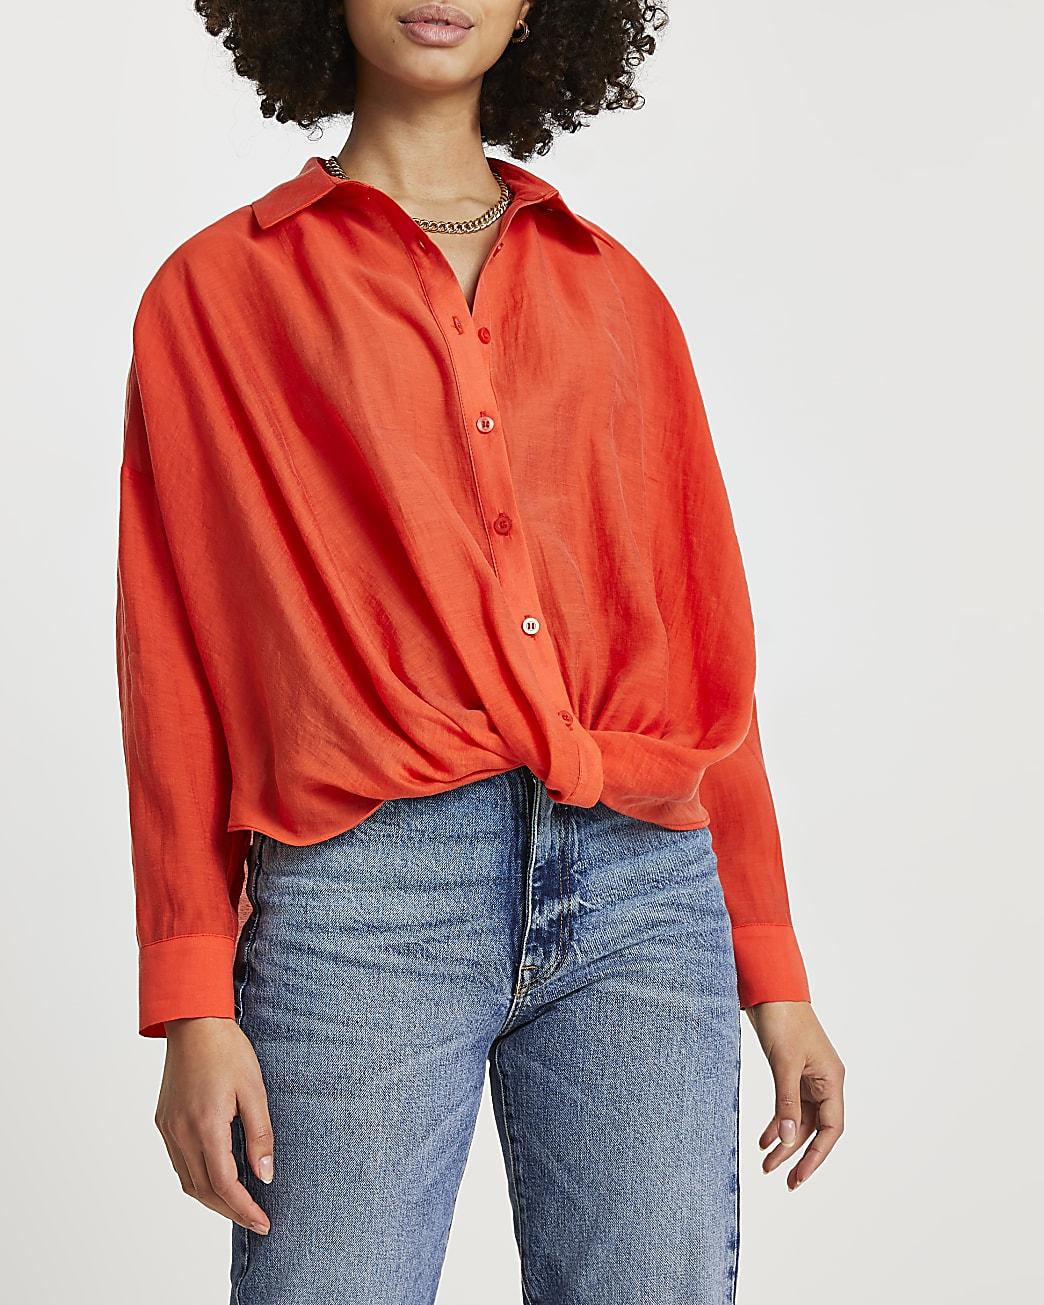 Orange knot front long sleeve shirt